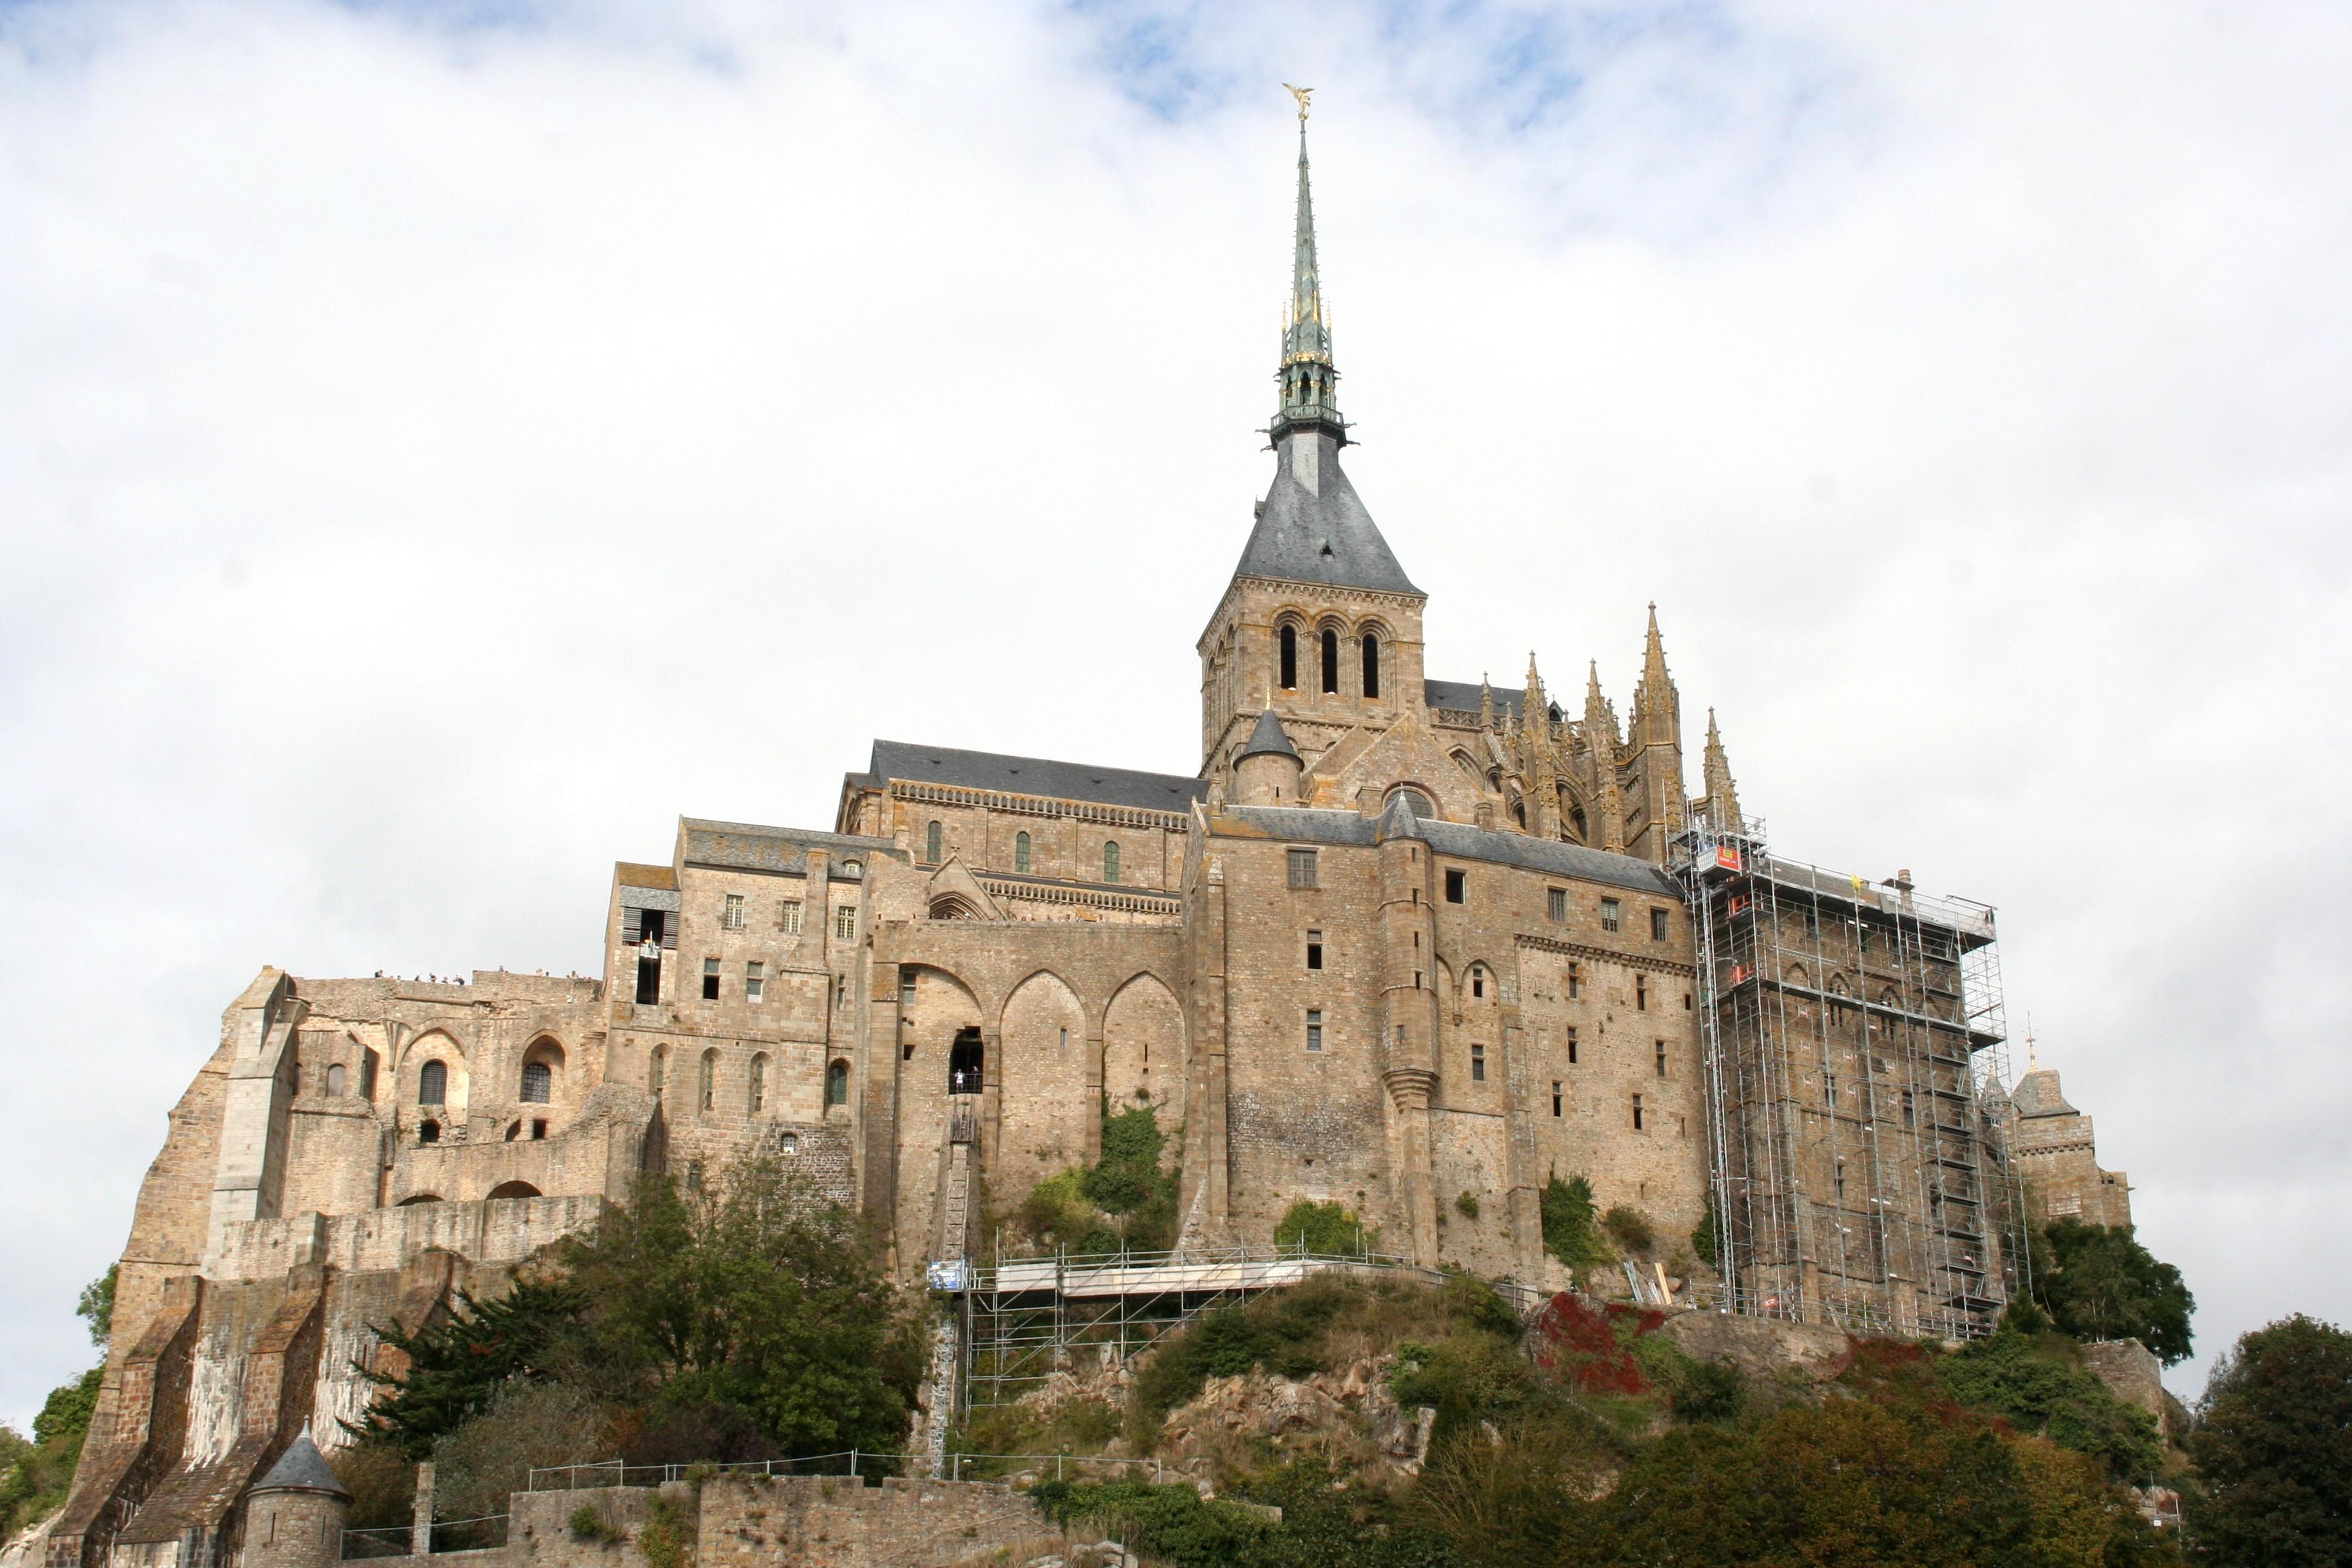 Top of Mont St Michel